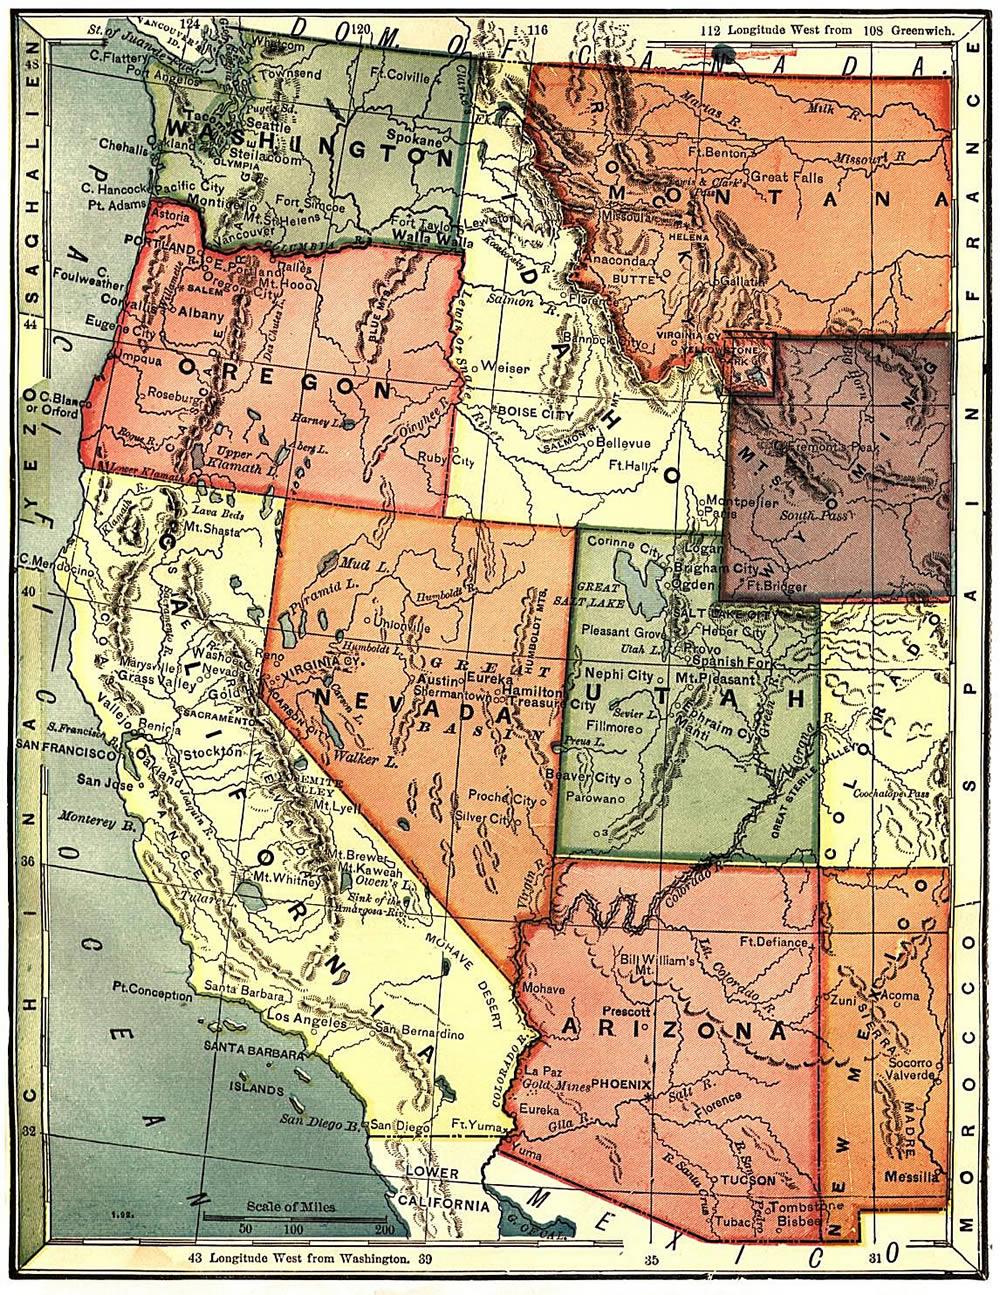 California Trail System - California Trail Map